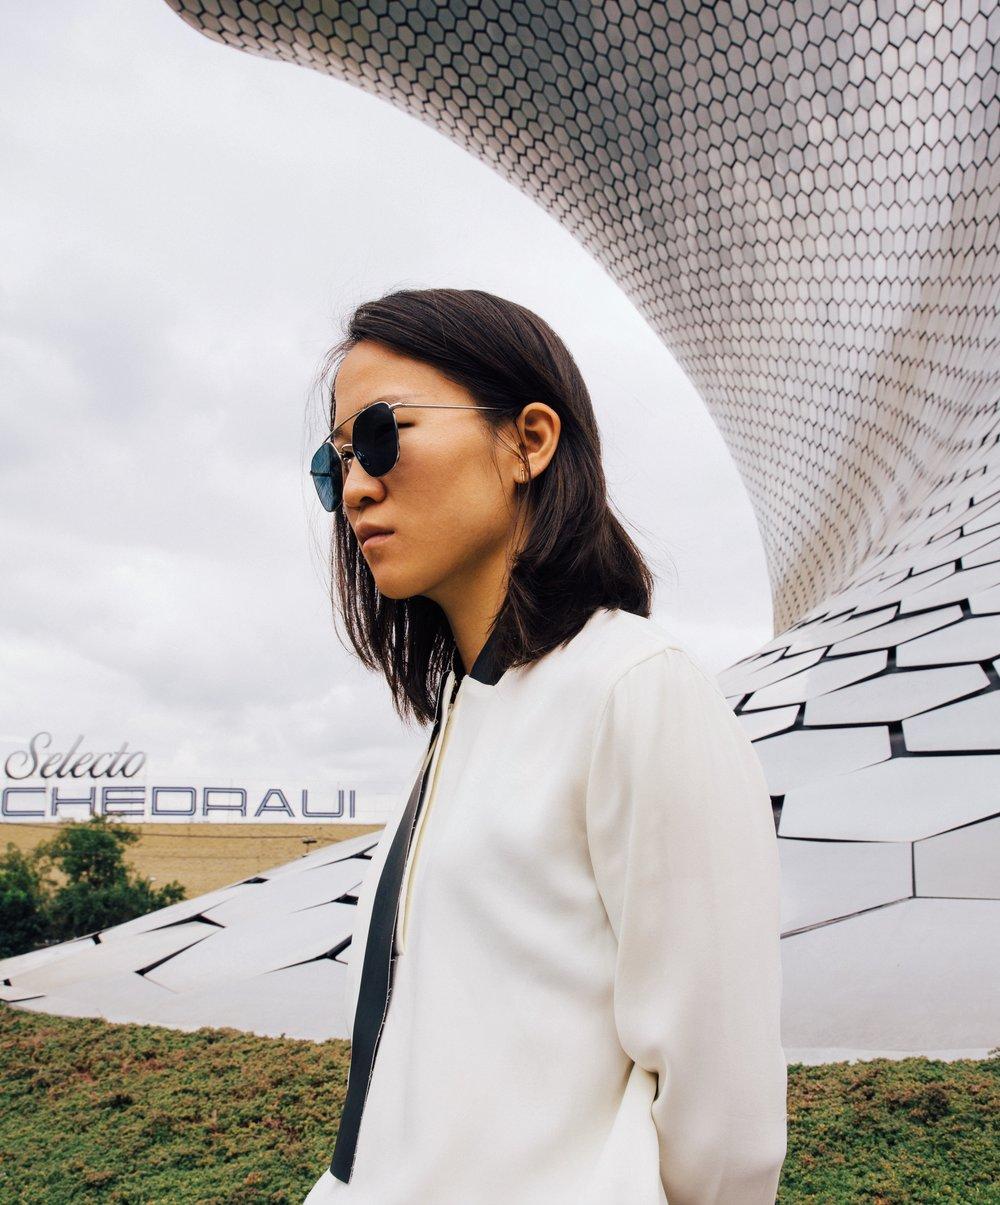 alexander wang blouse, ahlem sunglasses, loren stewart rod studs |photo by  Daniel Han